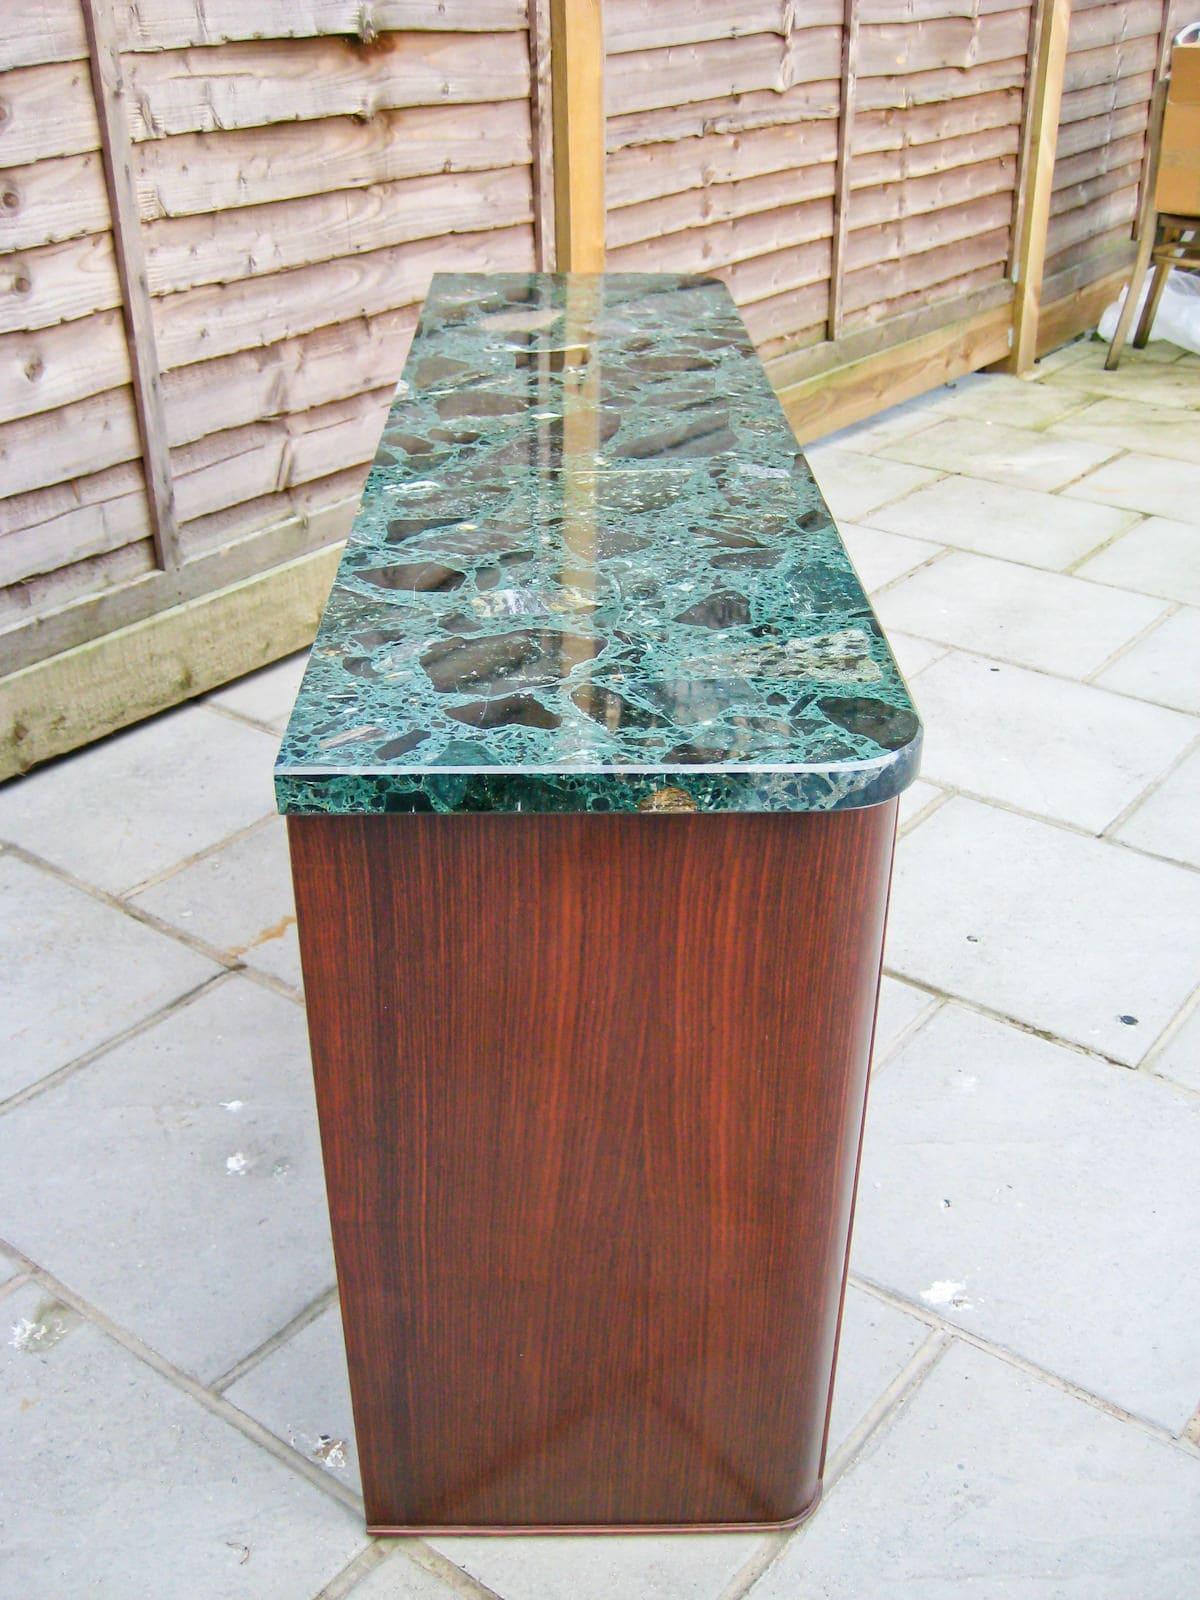 Marble vintage sideboard Italian design 1950's